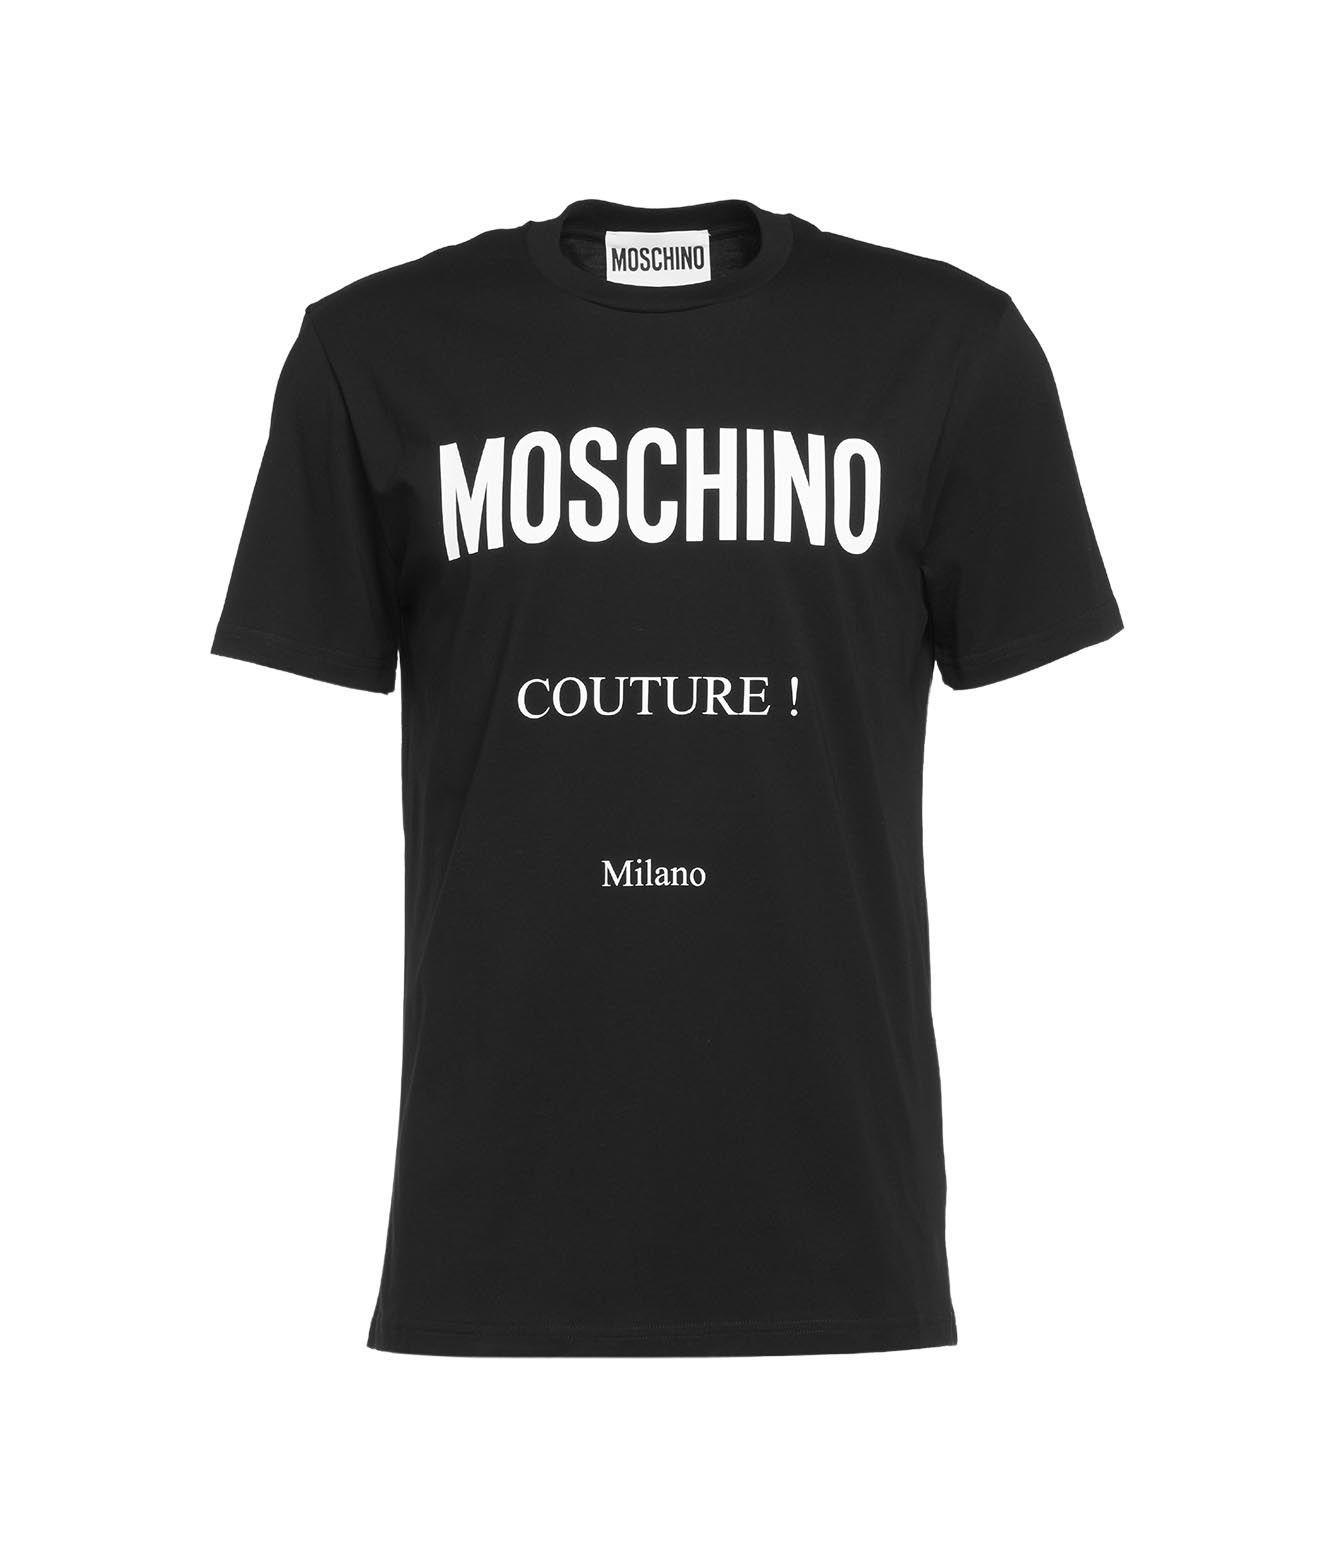 Moschino T-shirts MOSCHINO MEN'S BLACK OTHER MATERIALS T-SHIRT